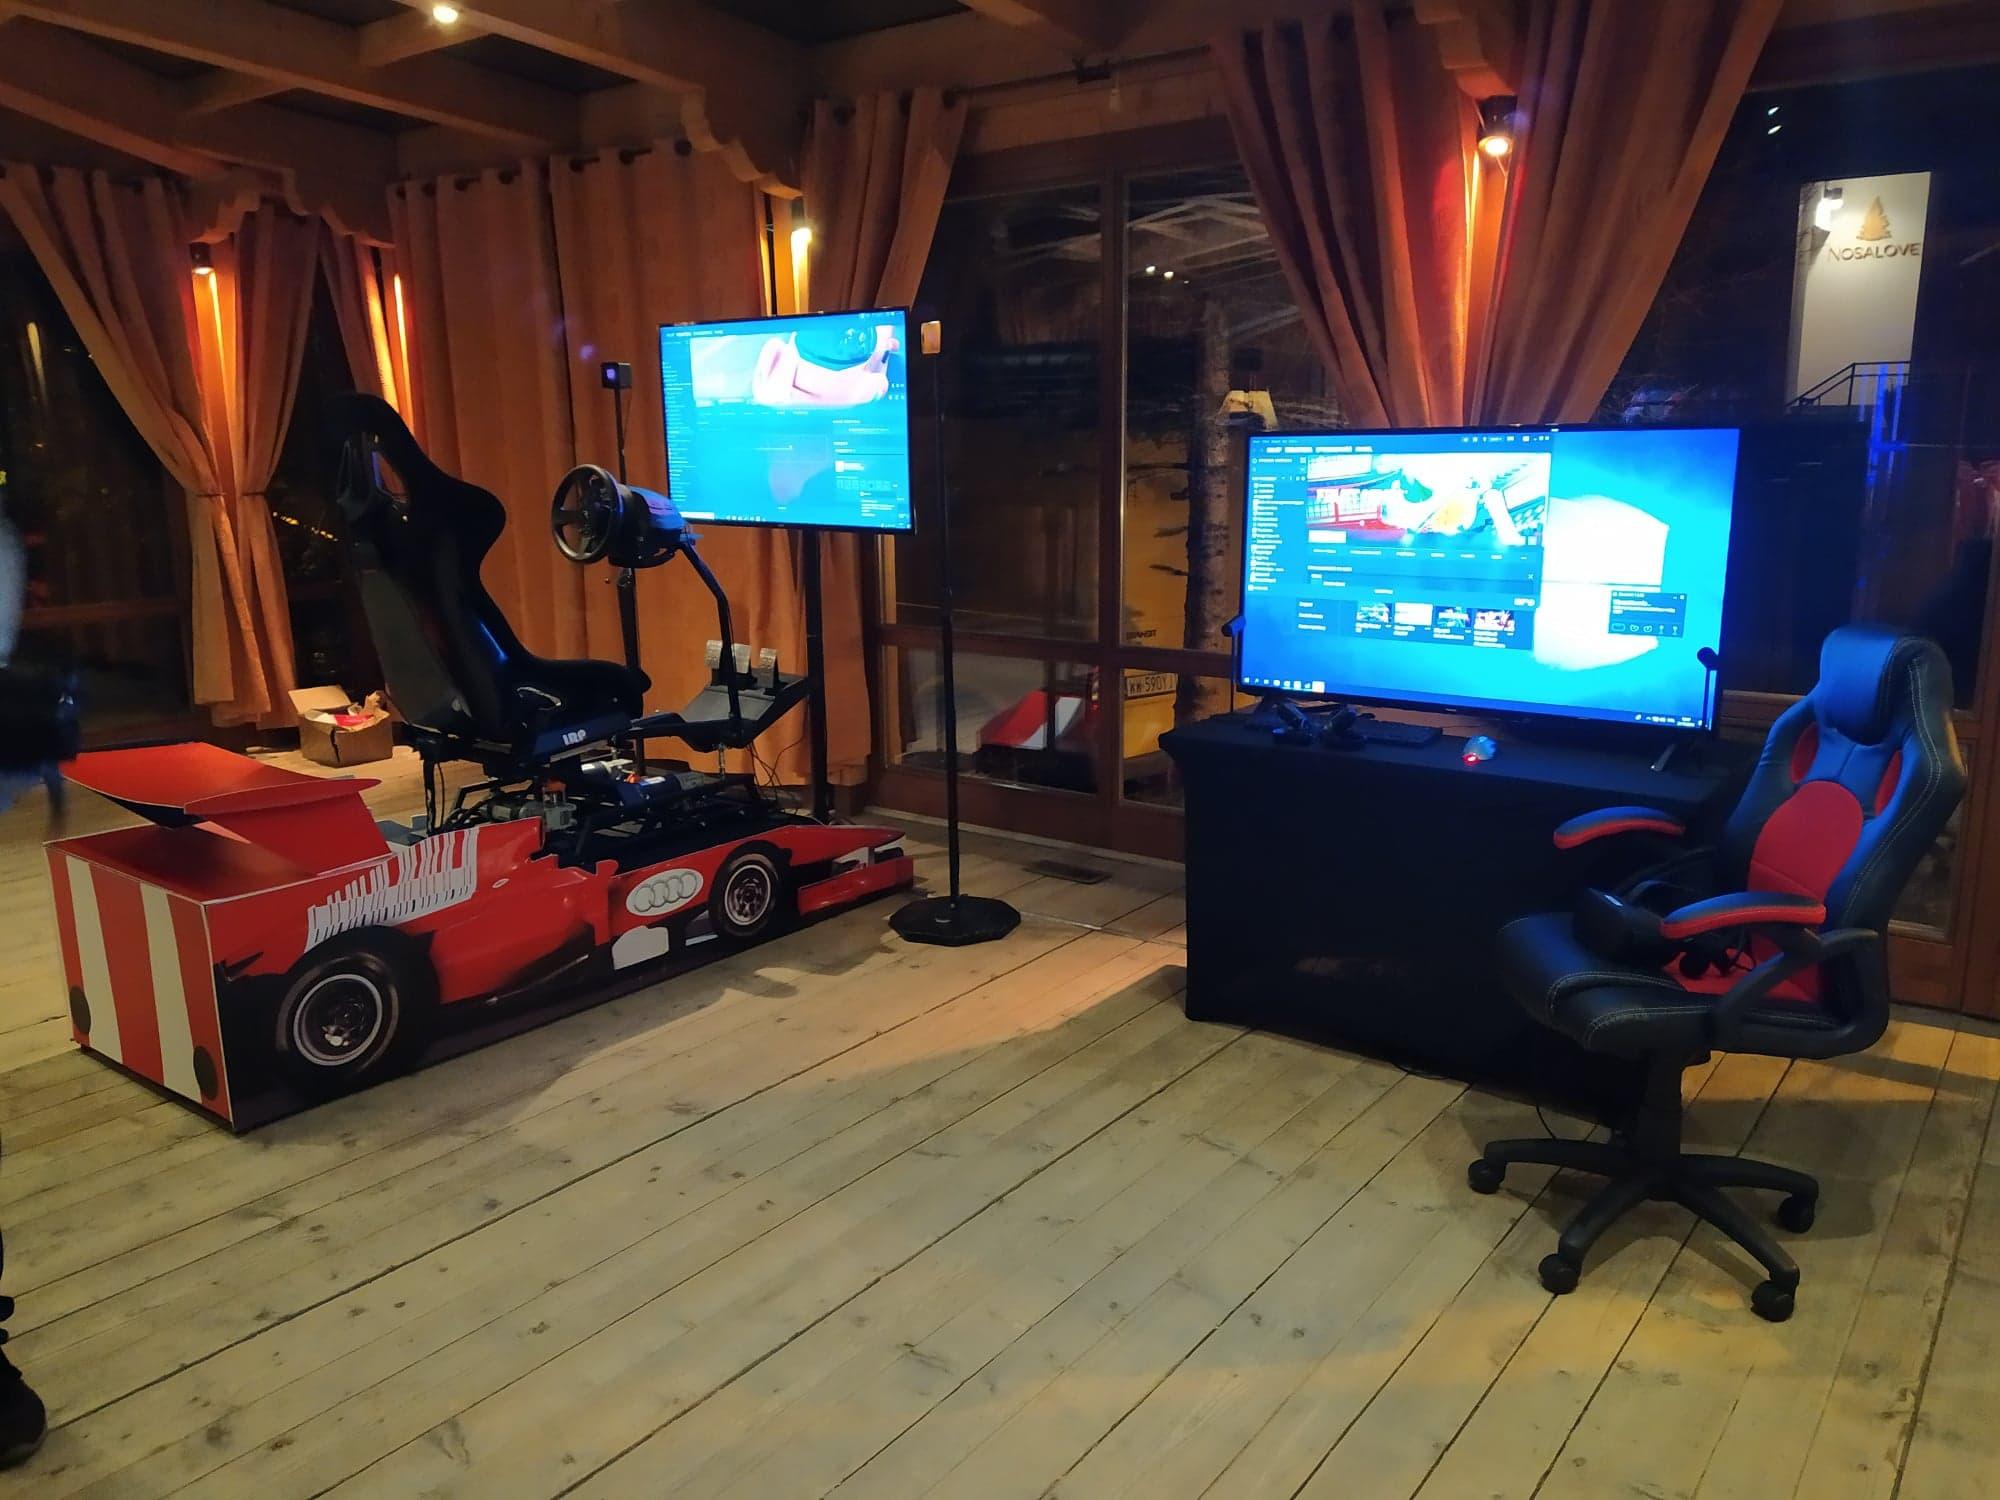 Symulator rajdowy VR 3DOF na event, imprezę, targi, konferencje